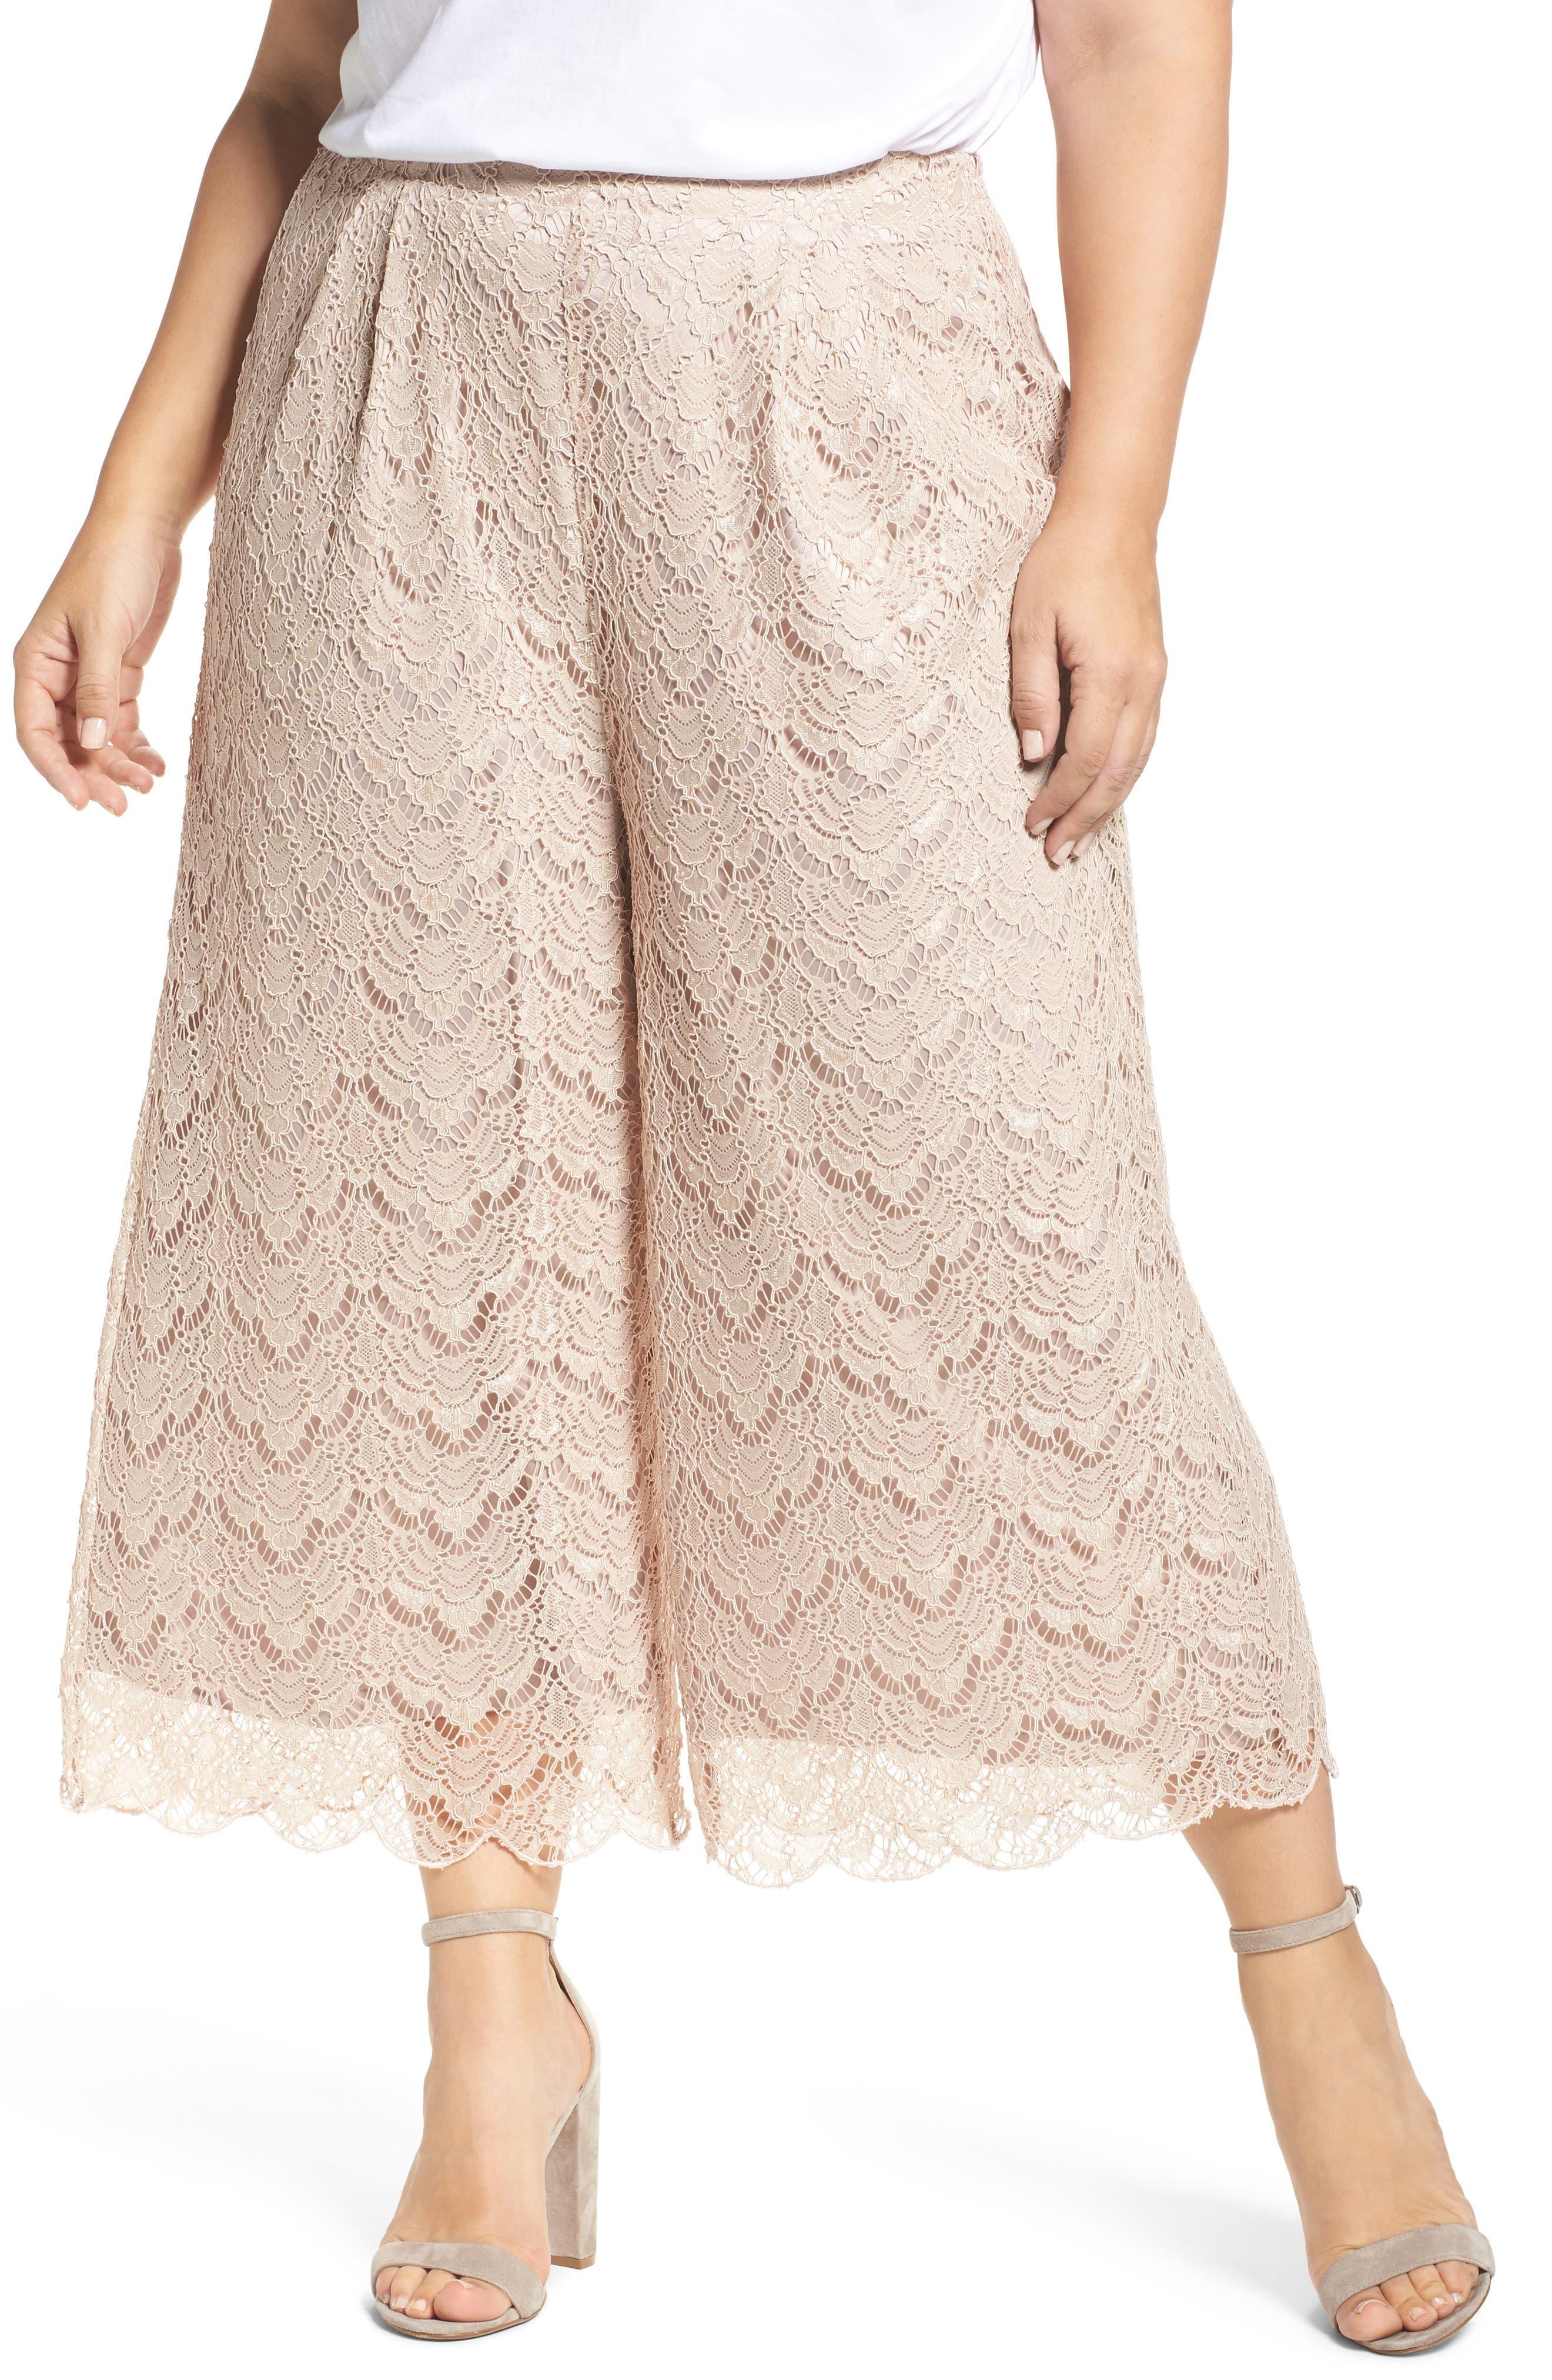 Alternate Image 1 Selected - ELVI Lace Culottes (Plus Size)